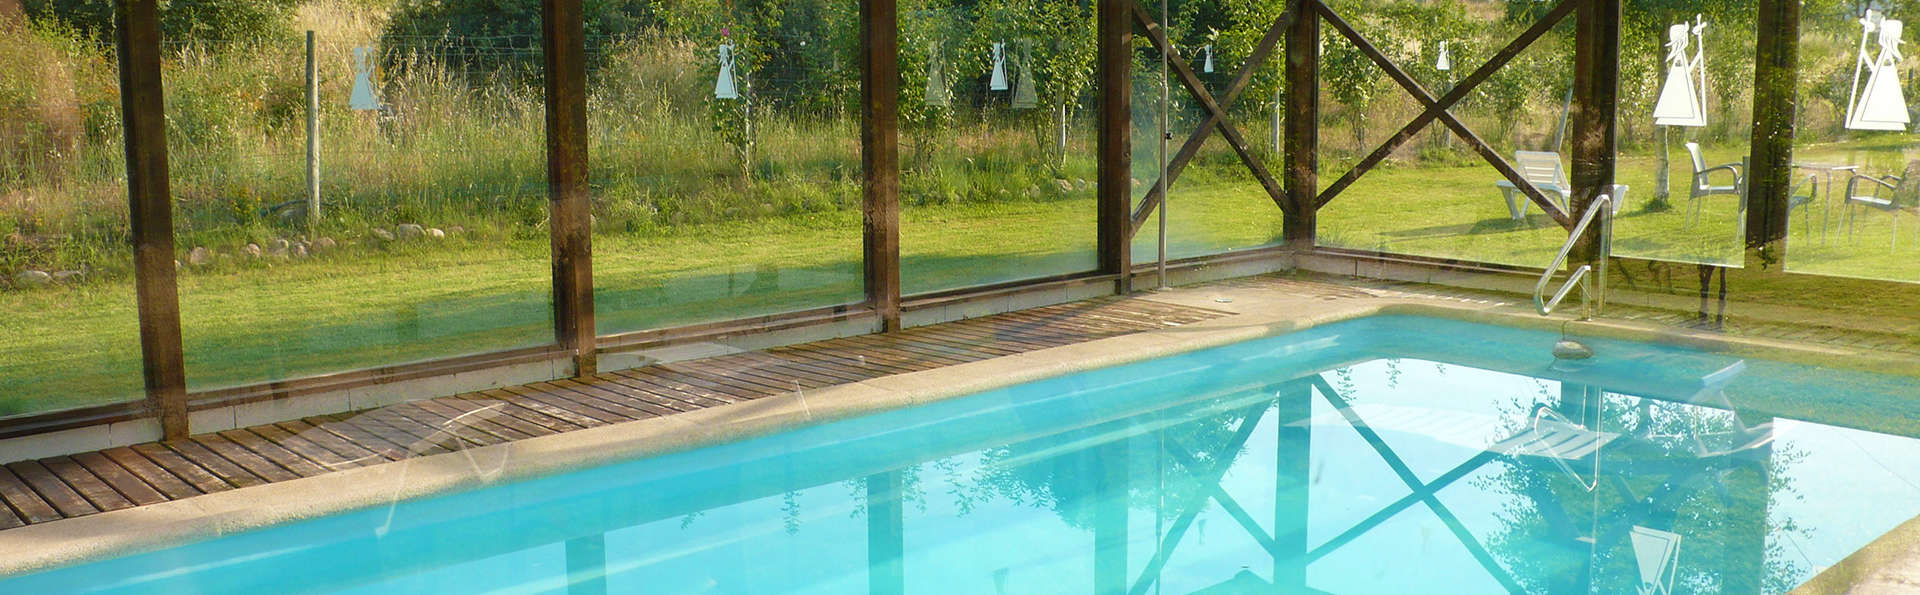 Hotel Rural La Peregrina - EDIT_Pool.jpg